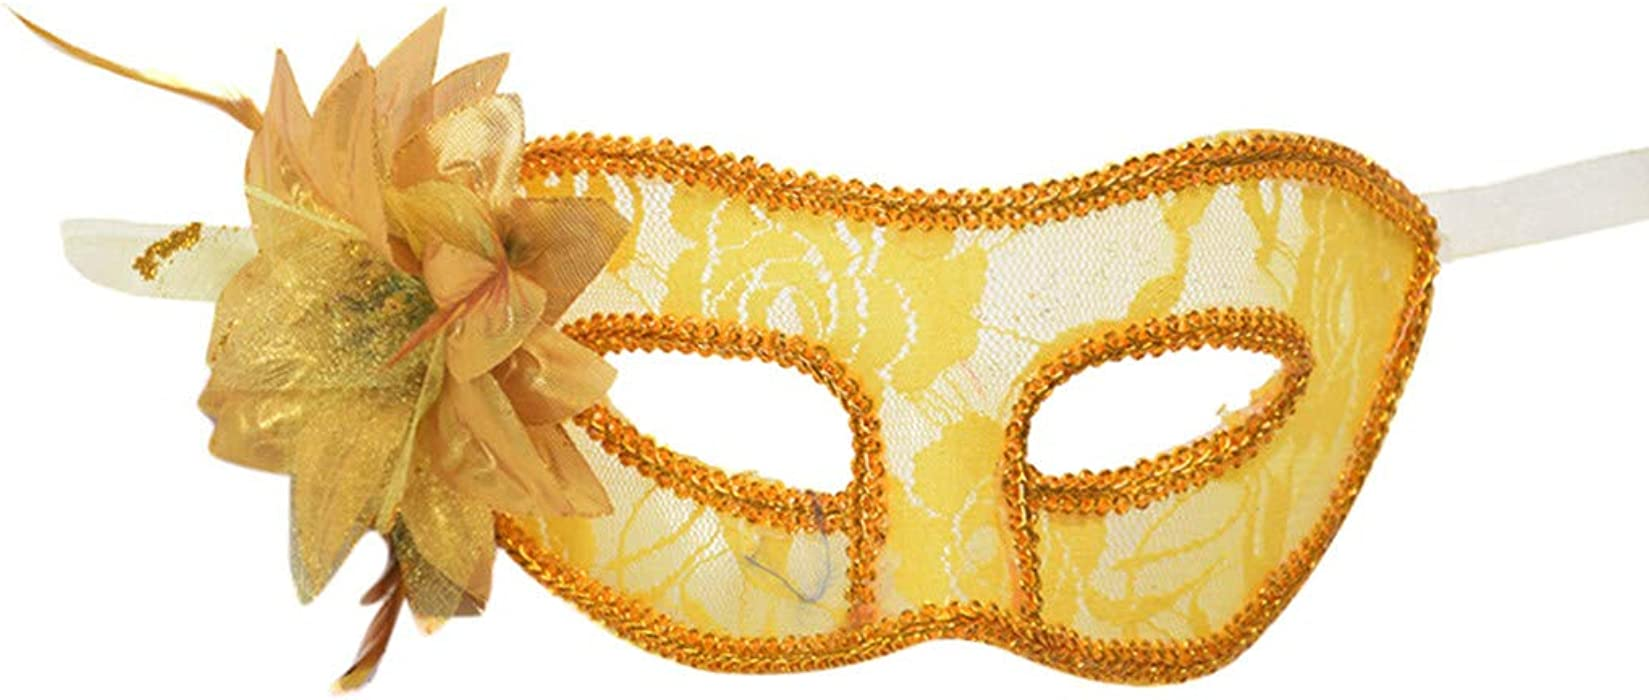 Amazon com: BEUU 2019 Carnival Mask Venetian Masquerade Masks Mardi